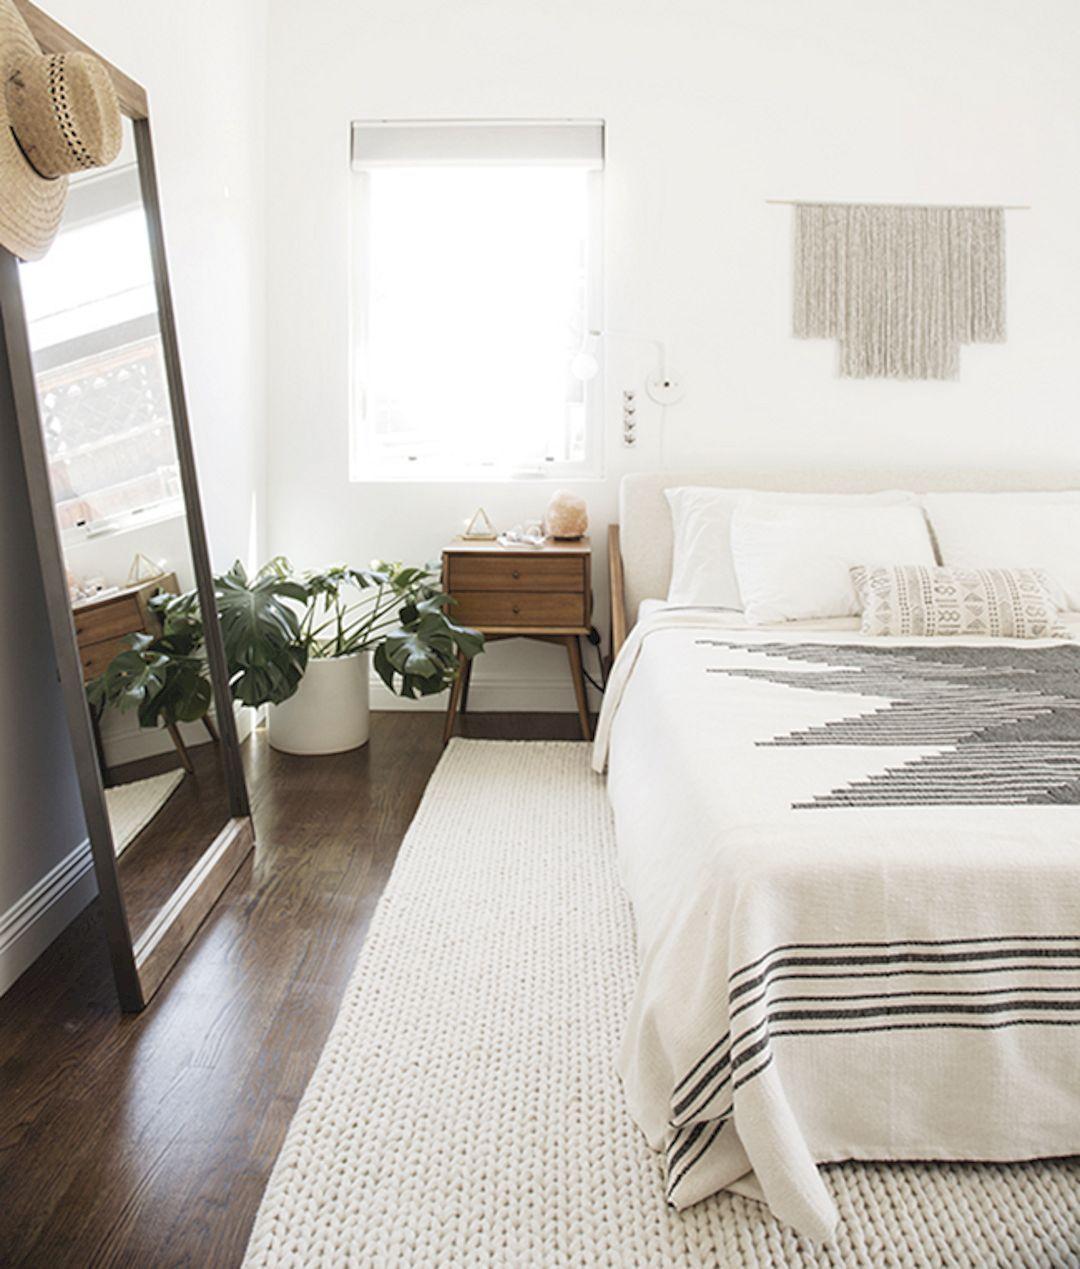 Apartment ideas Gorgeous Minimalist Home Decor Ideas